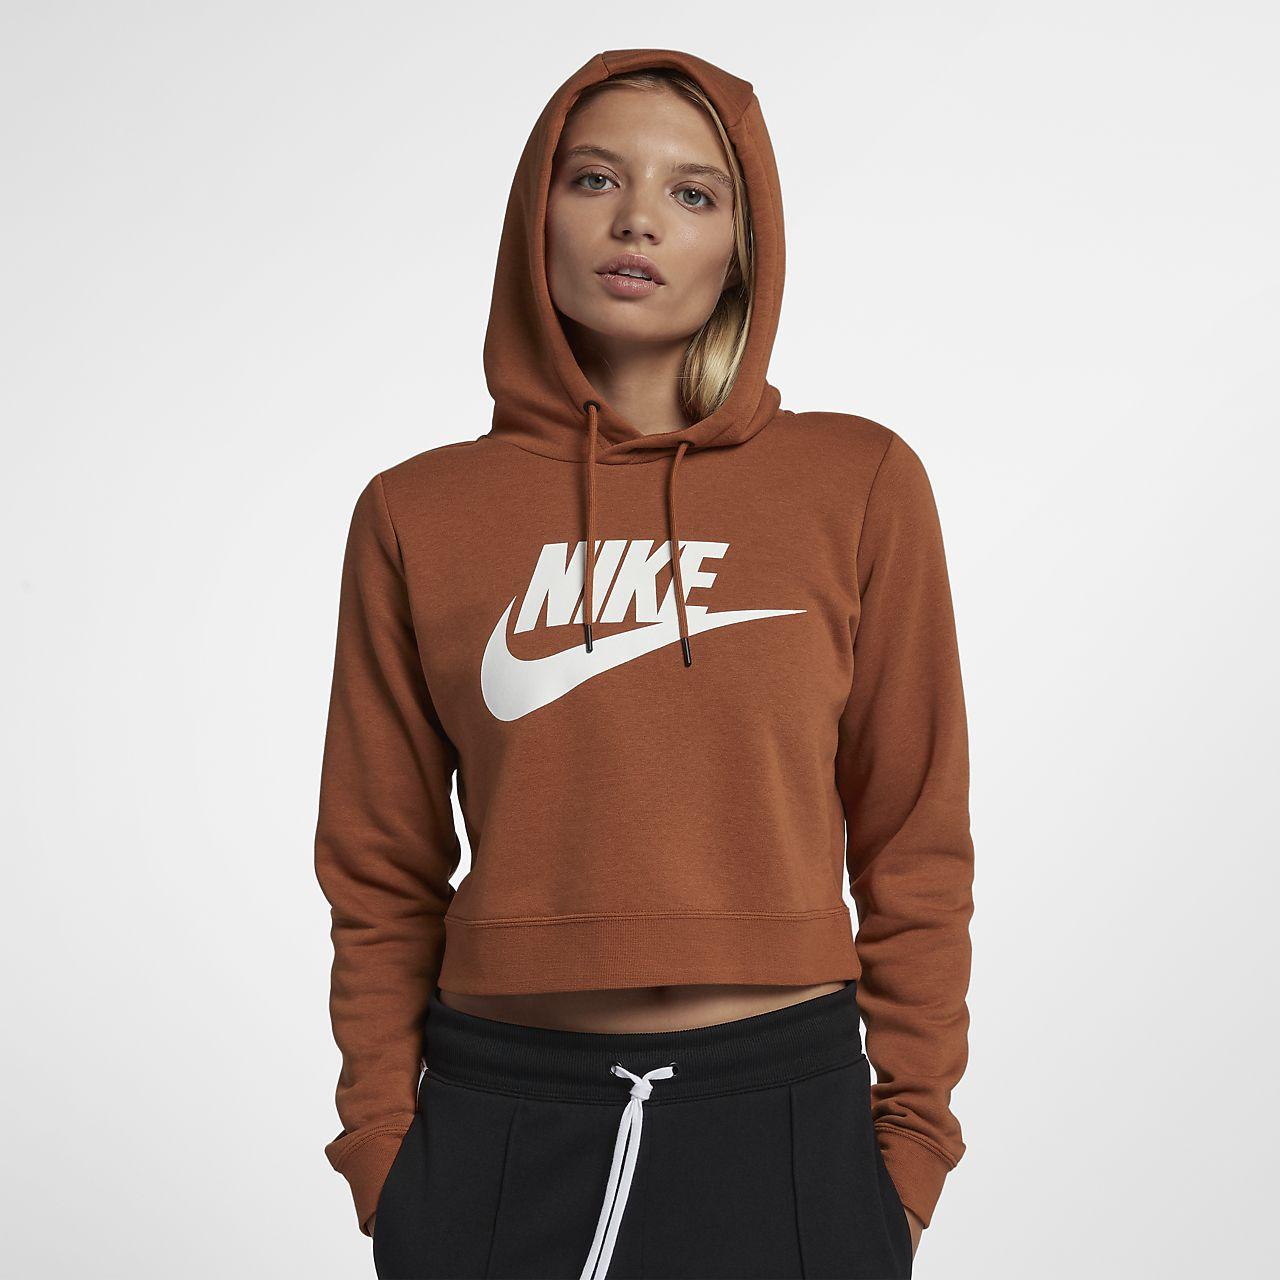 81e93fdb03 Rally Pour À Sweat Nike Be Capuche Court Femme Sportswear nHCx4UqF